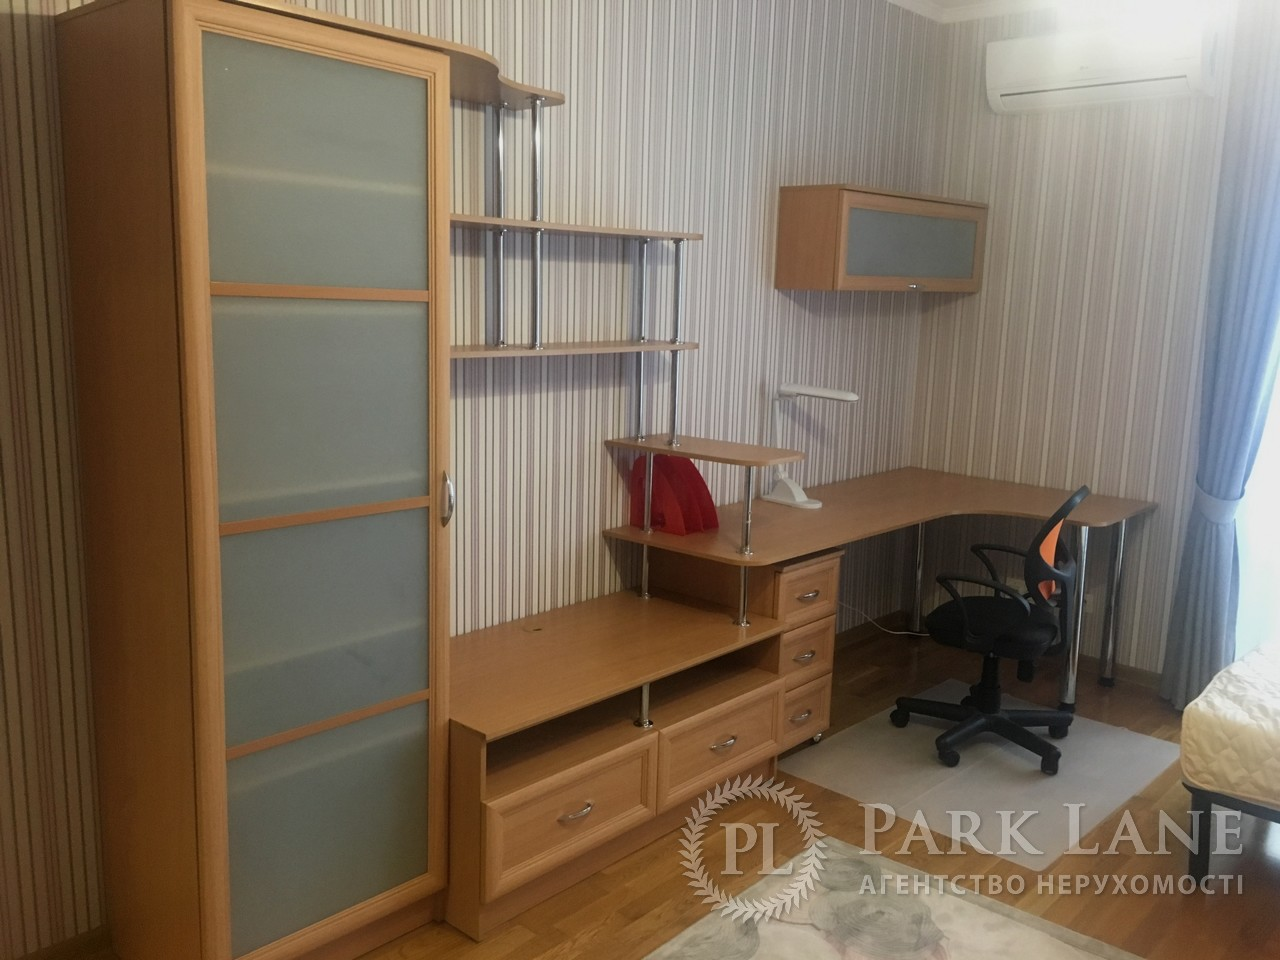 Квартира ул. Львовская, 22, Киев, X-12846 - Фото 8